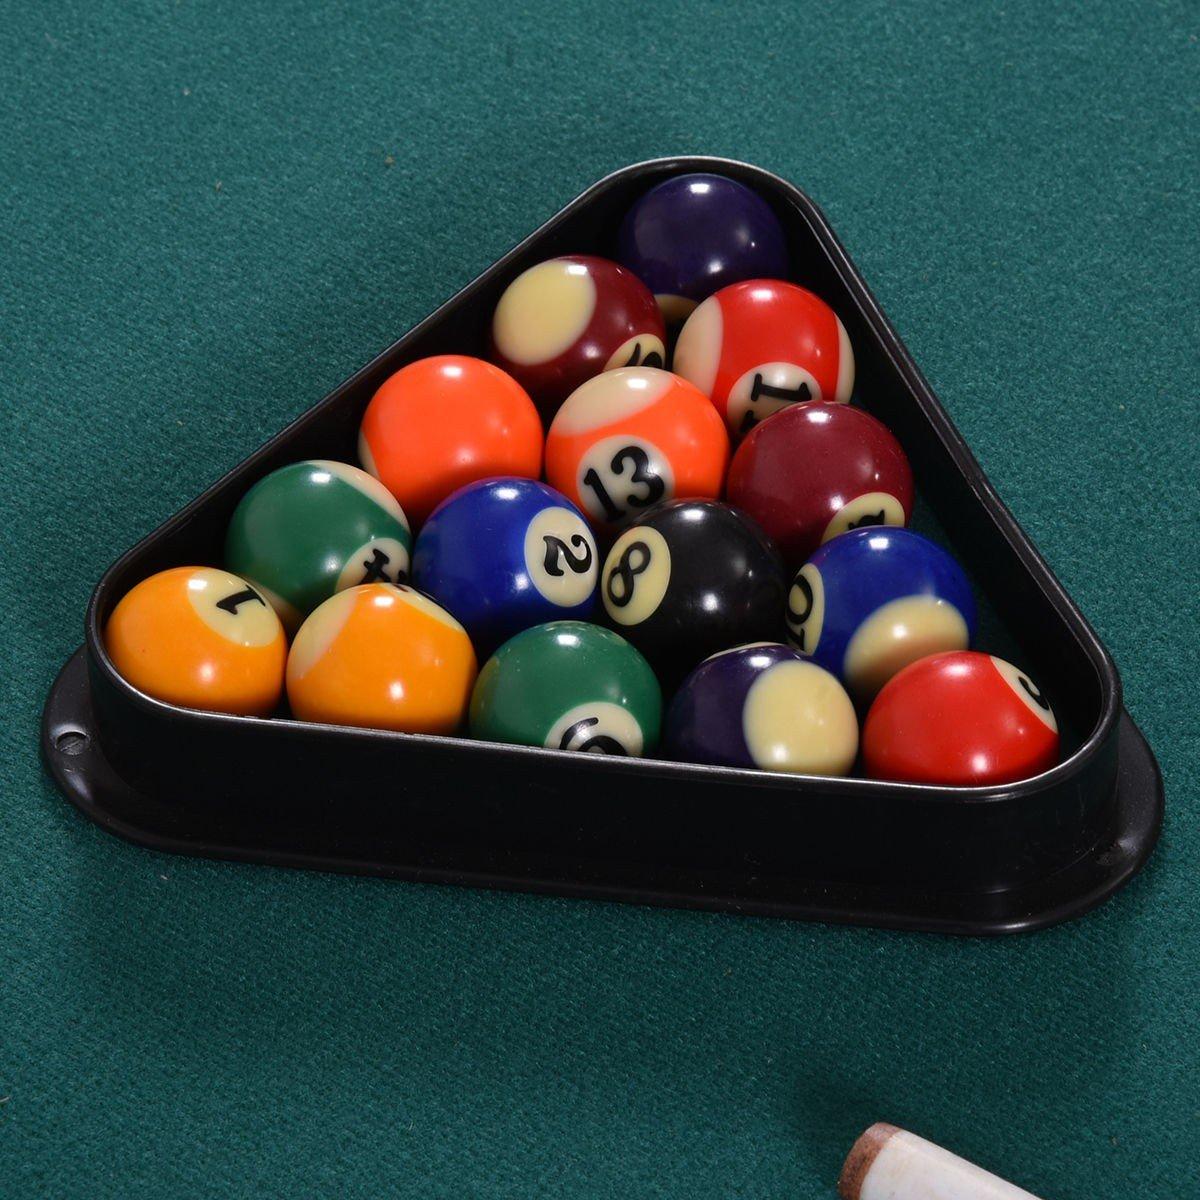 "36"" Mini Table Top Pool Table Game Billiard Set Cues Balls Gift ..."